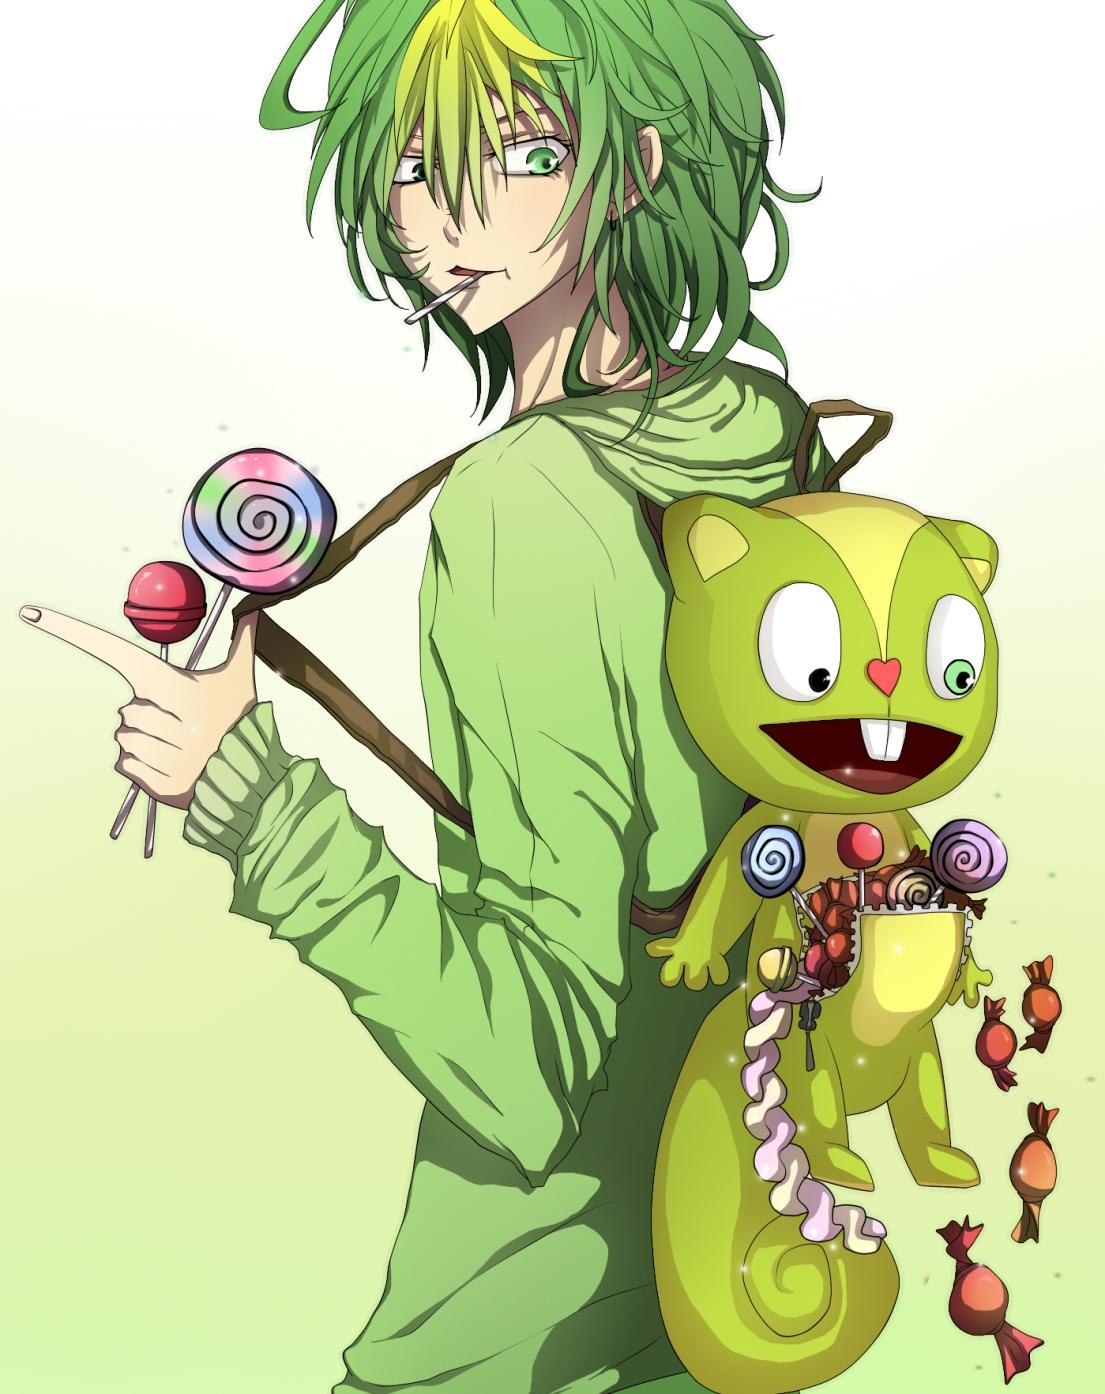 Shiroi-no-Usagi's Profile Picture